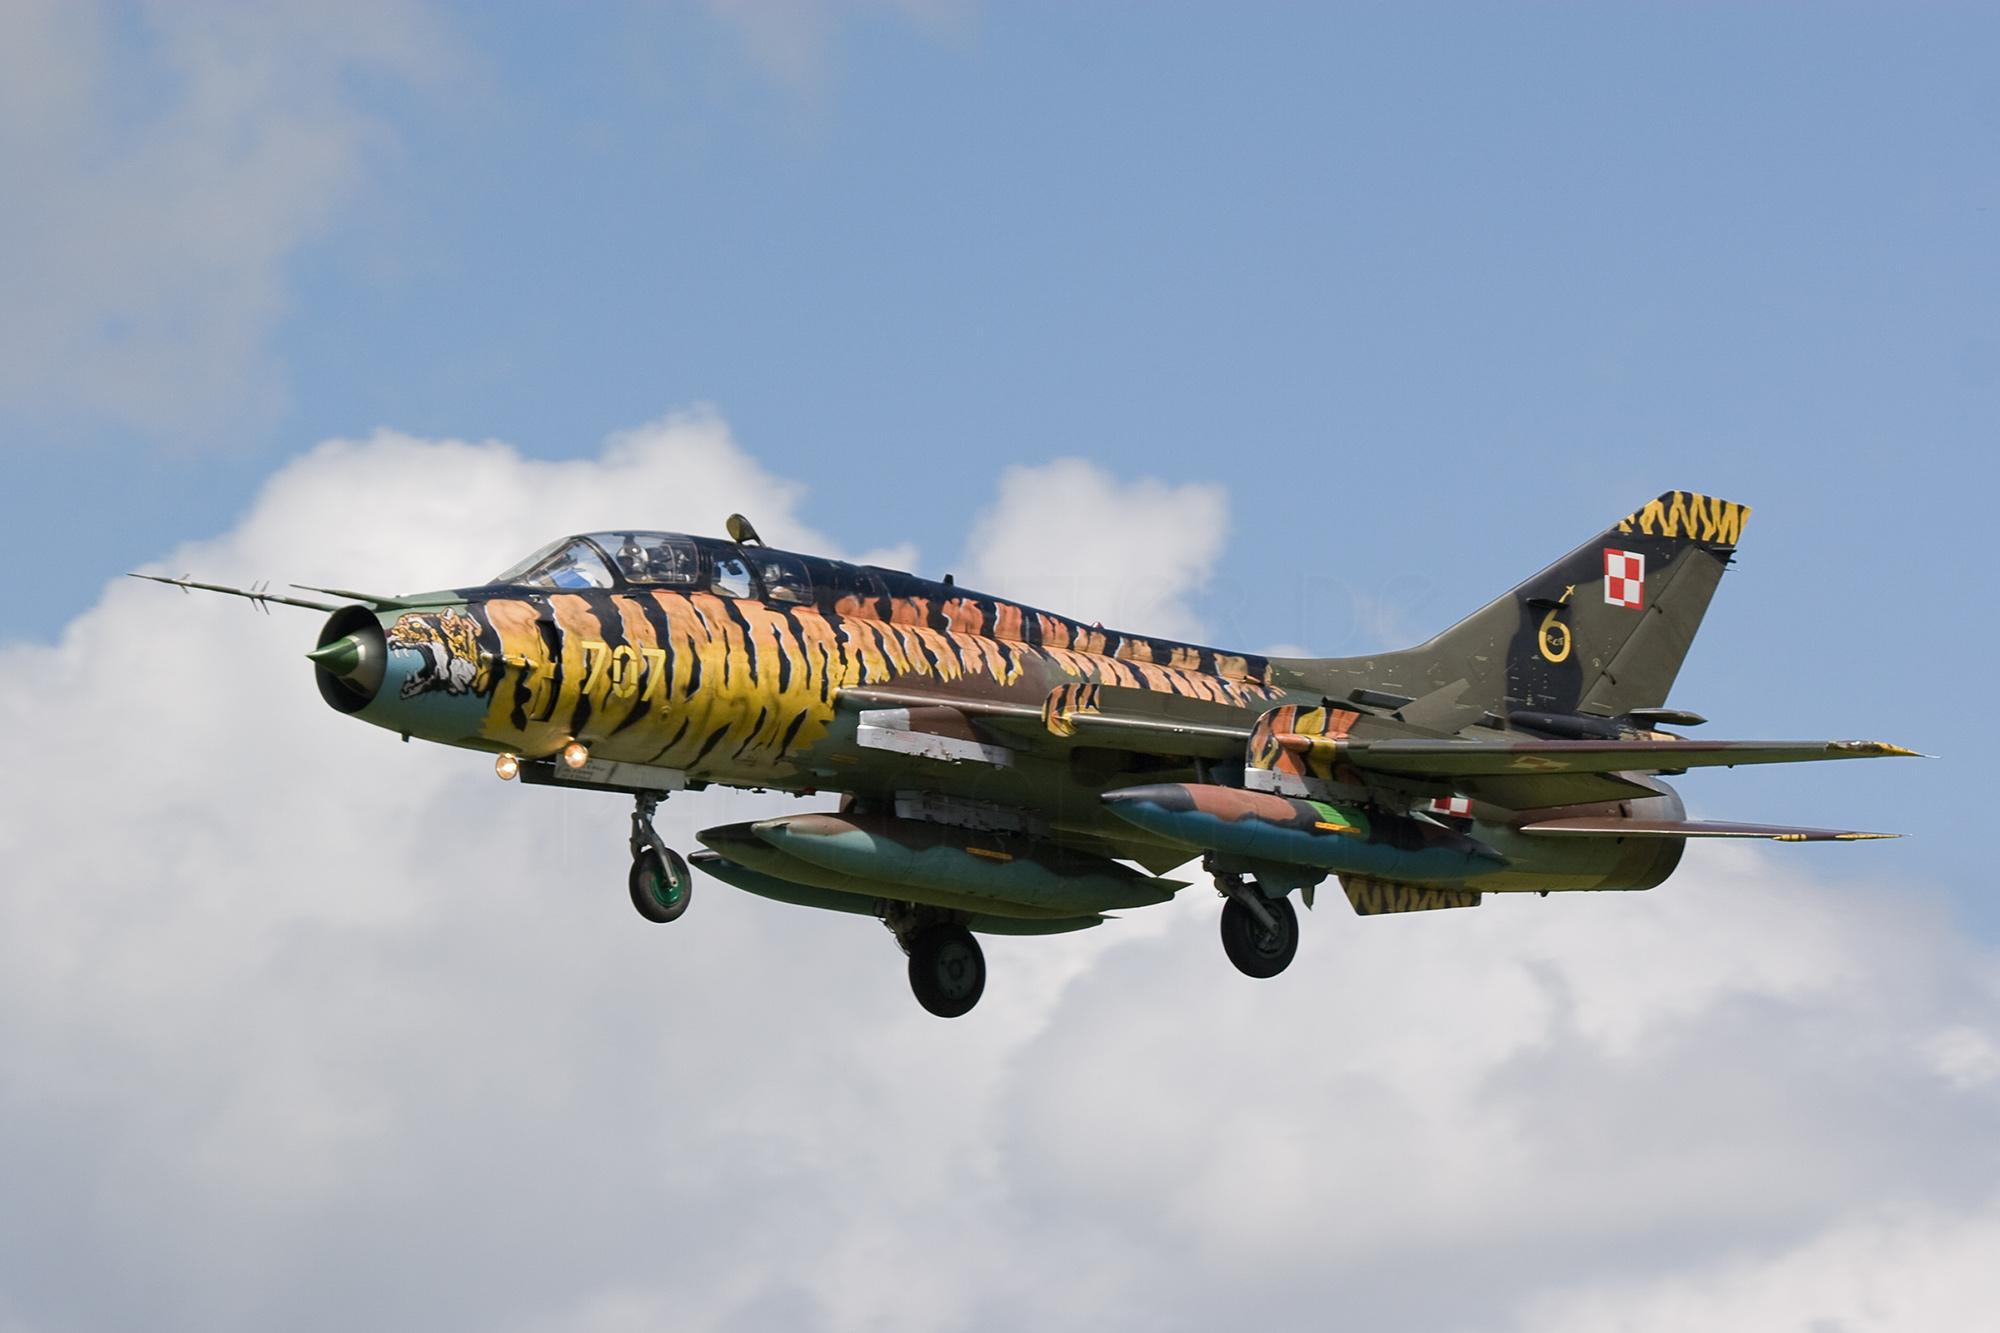 Airspotter.de 2008 Elite Polish Air Force Suchoj Su-22 Fitter